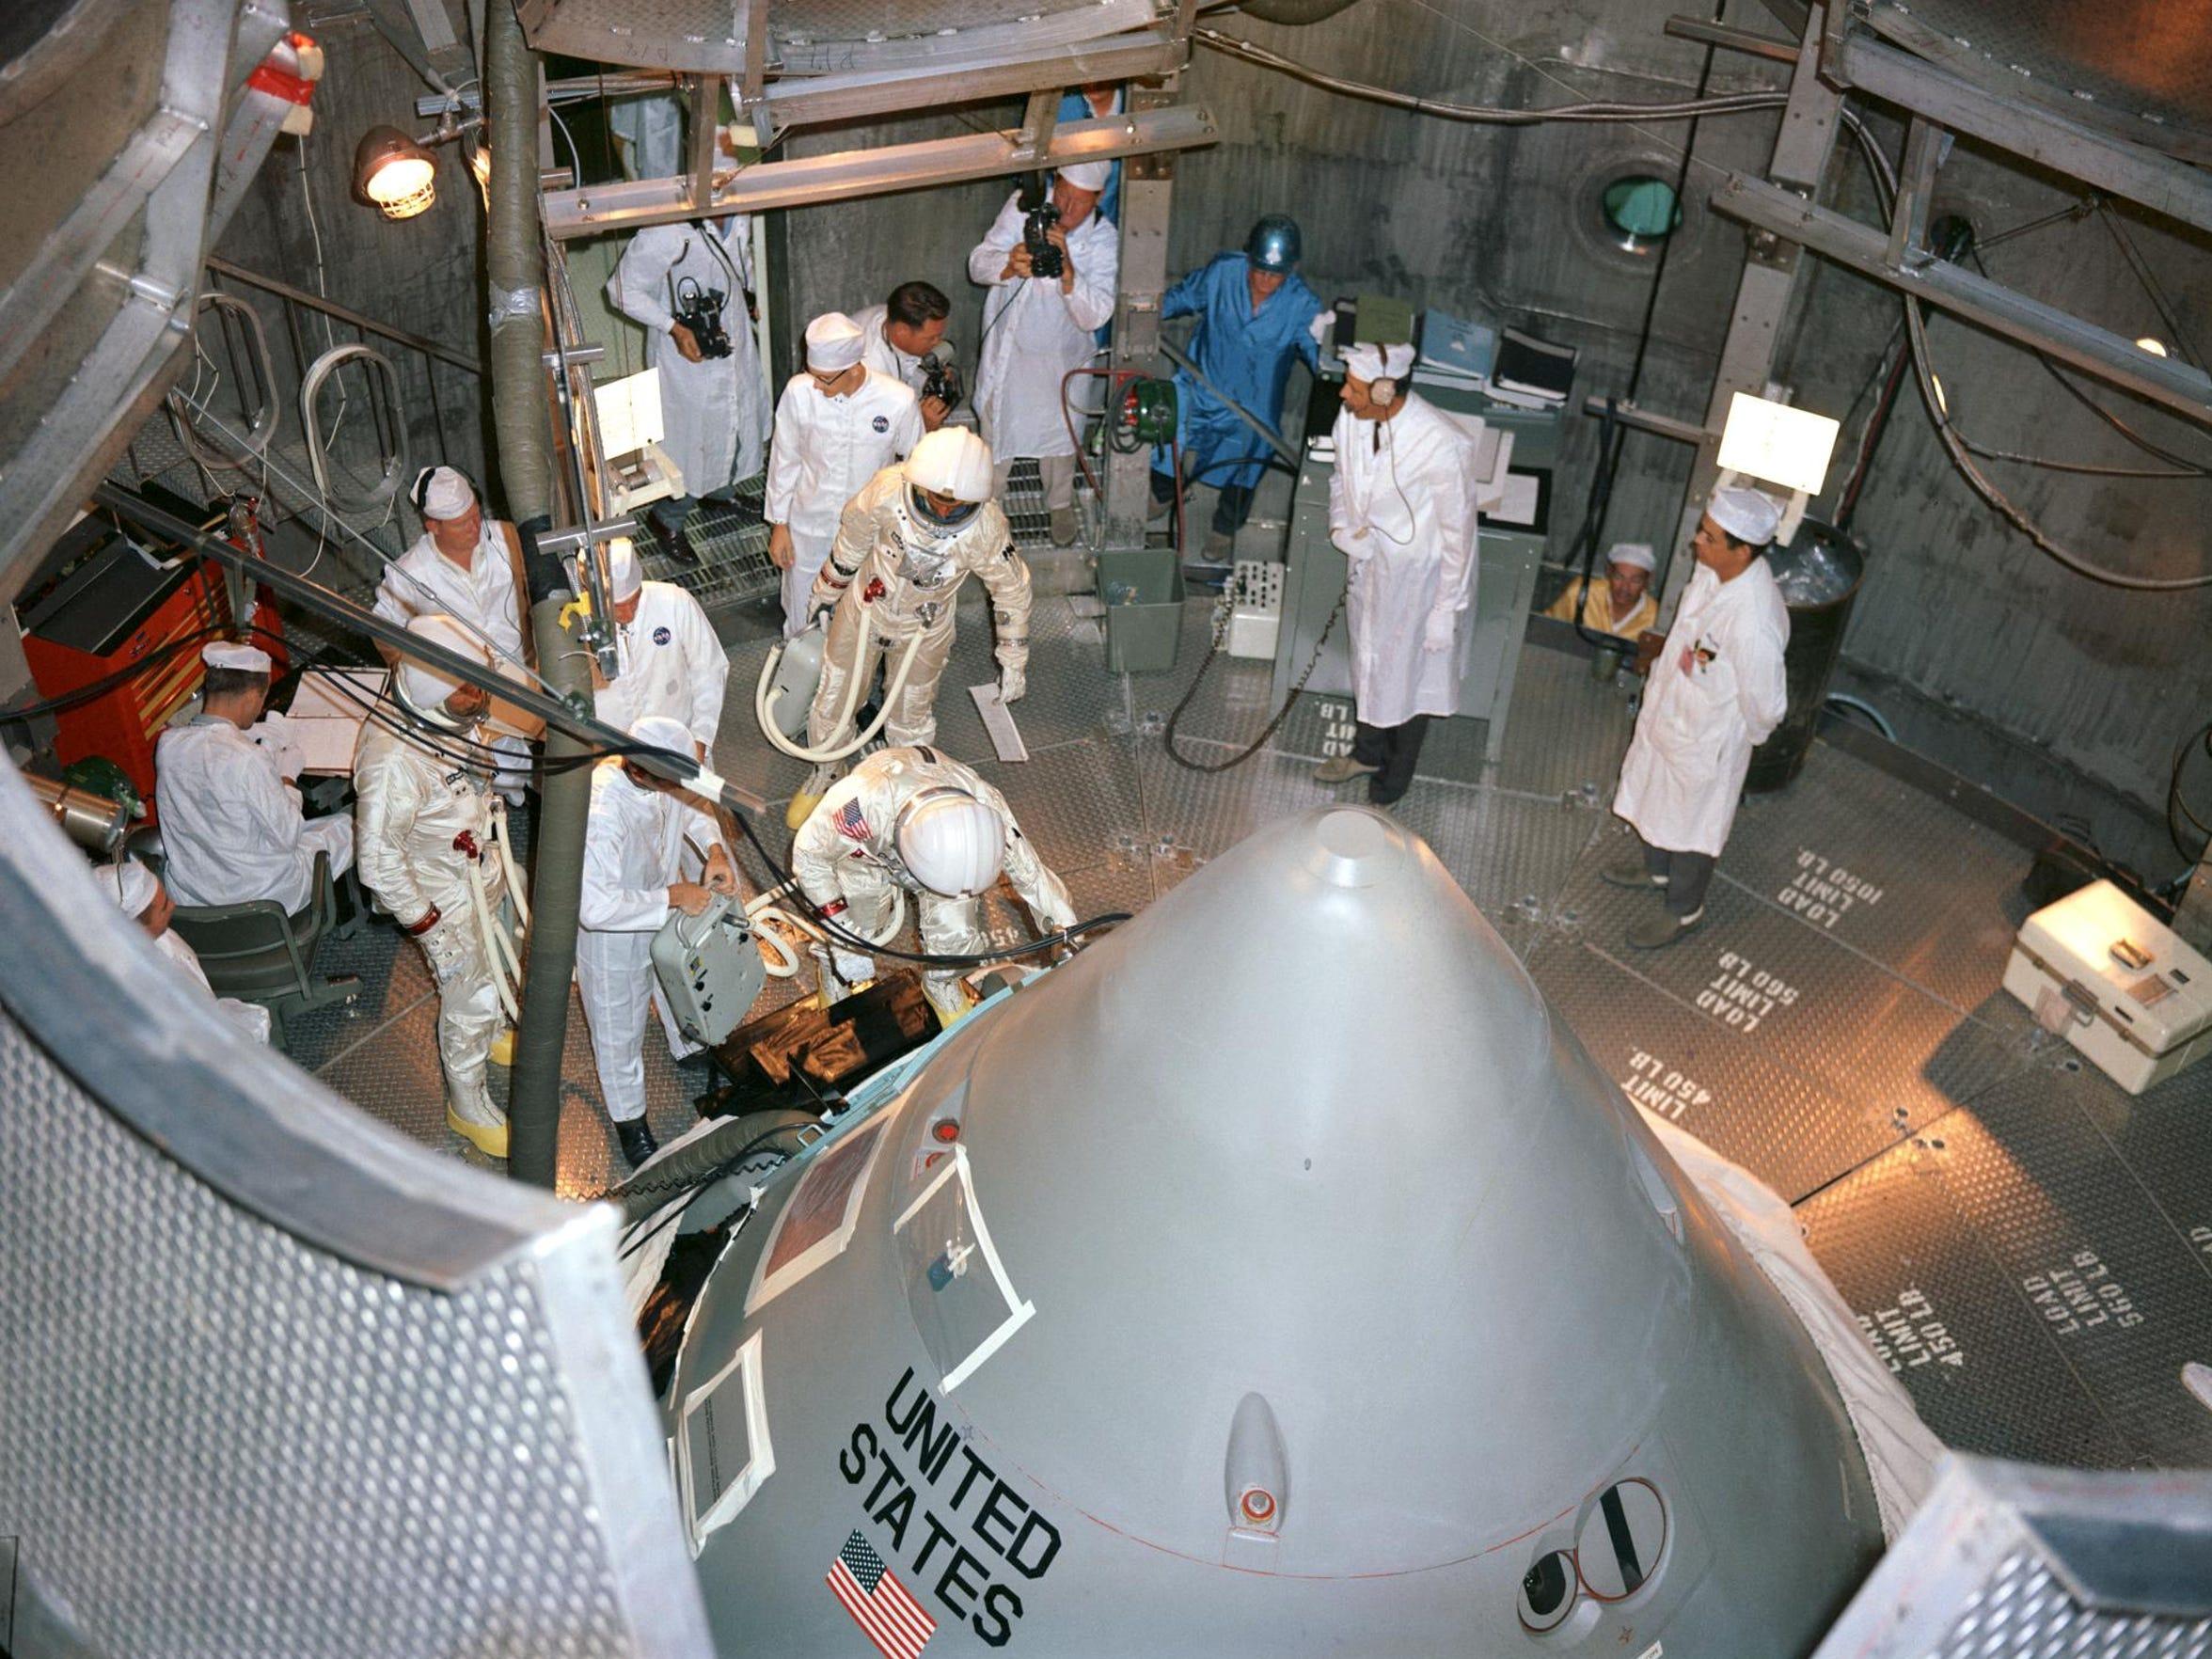 (18 Oct. 1966) --- The Apollo 1 prime crewmembers for